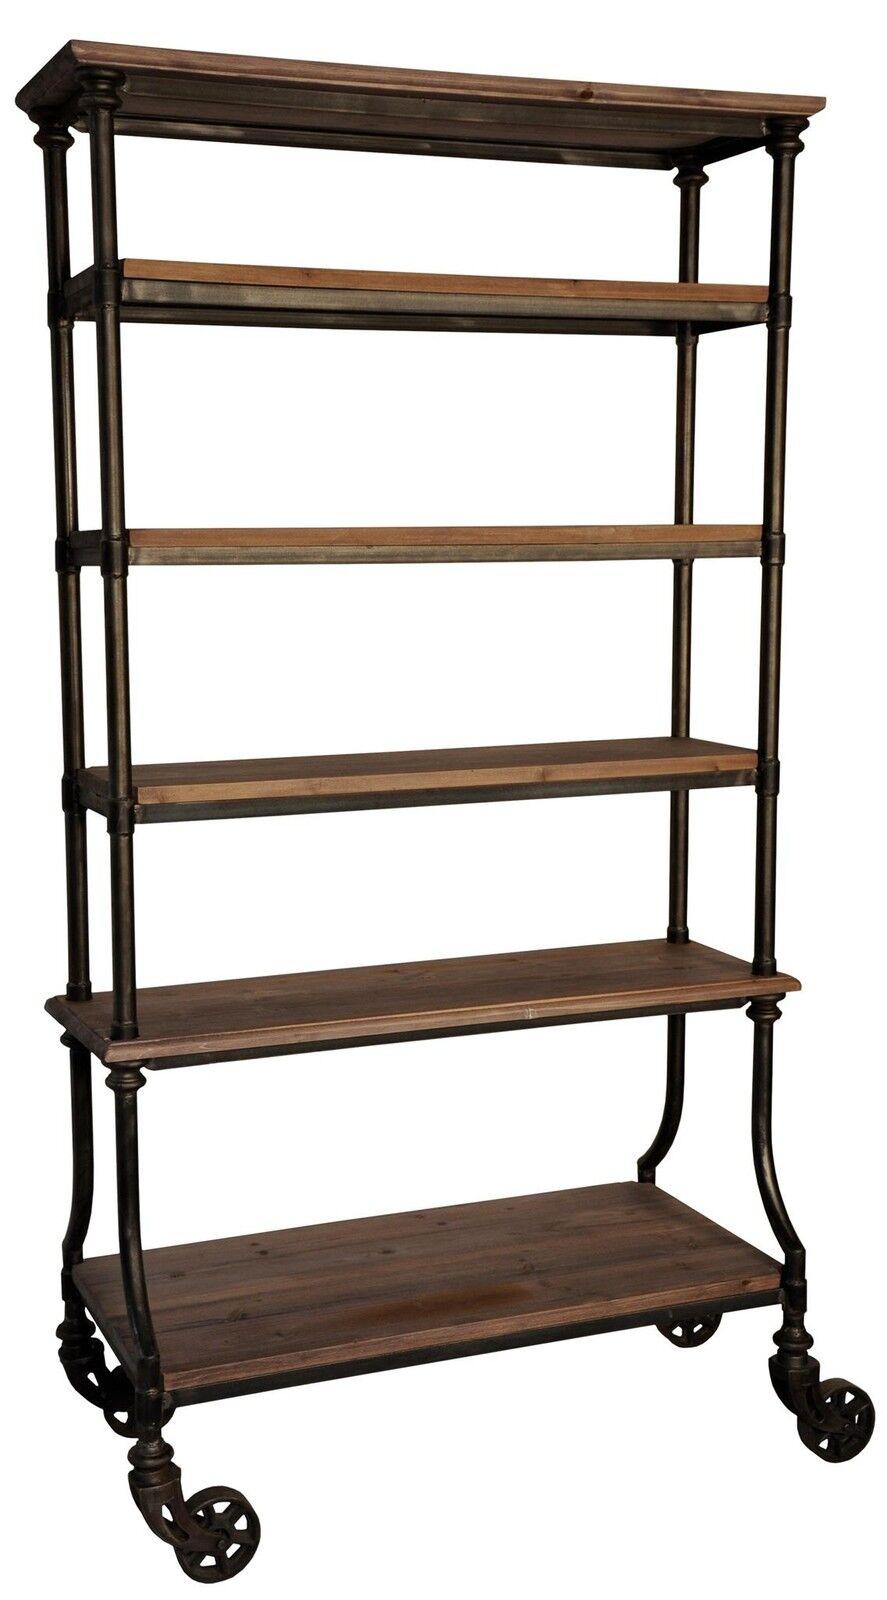 82 tall bookcase nat wood 6 shelves rusty metal on. Black Bedroom Furniture Sets. Home Design Ideas